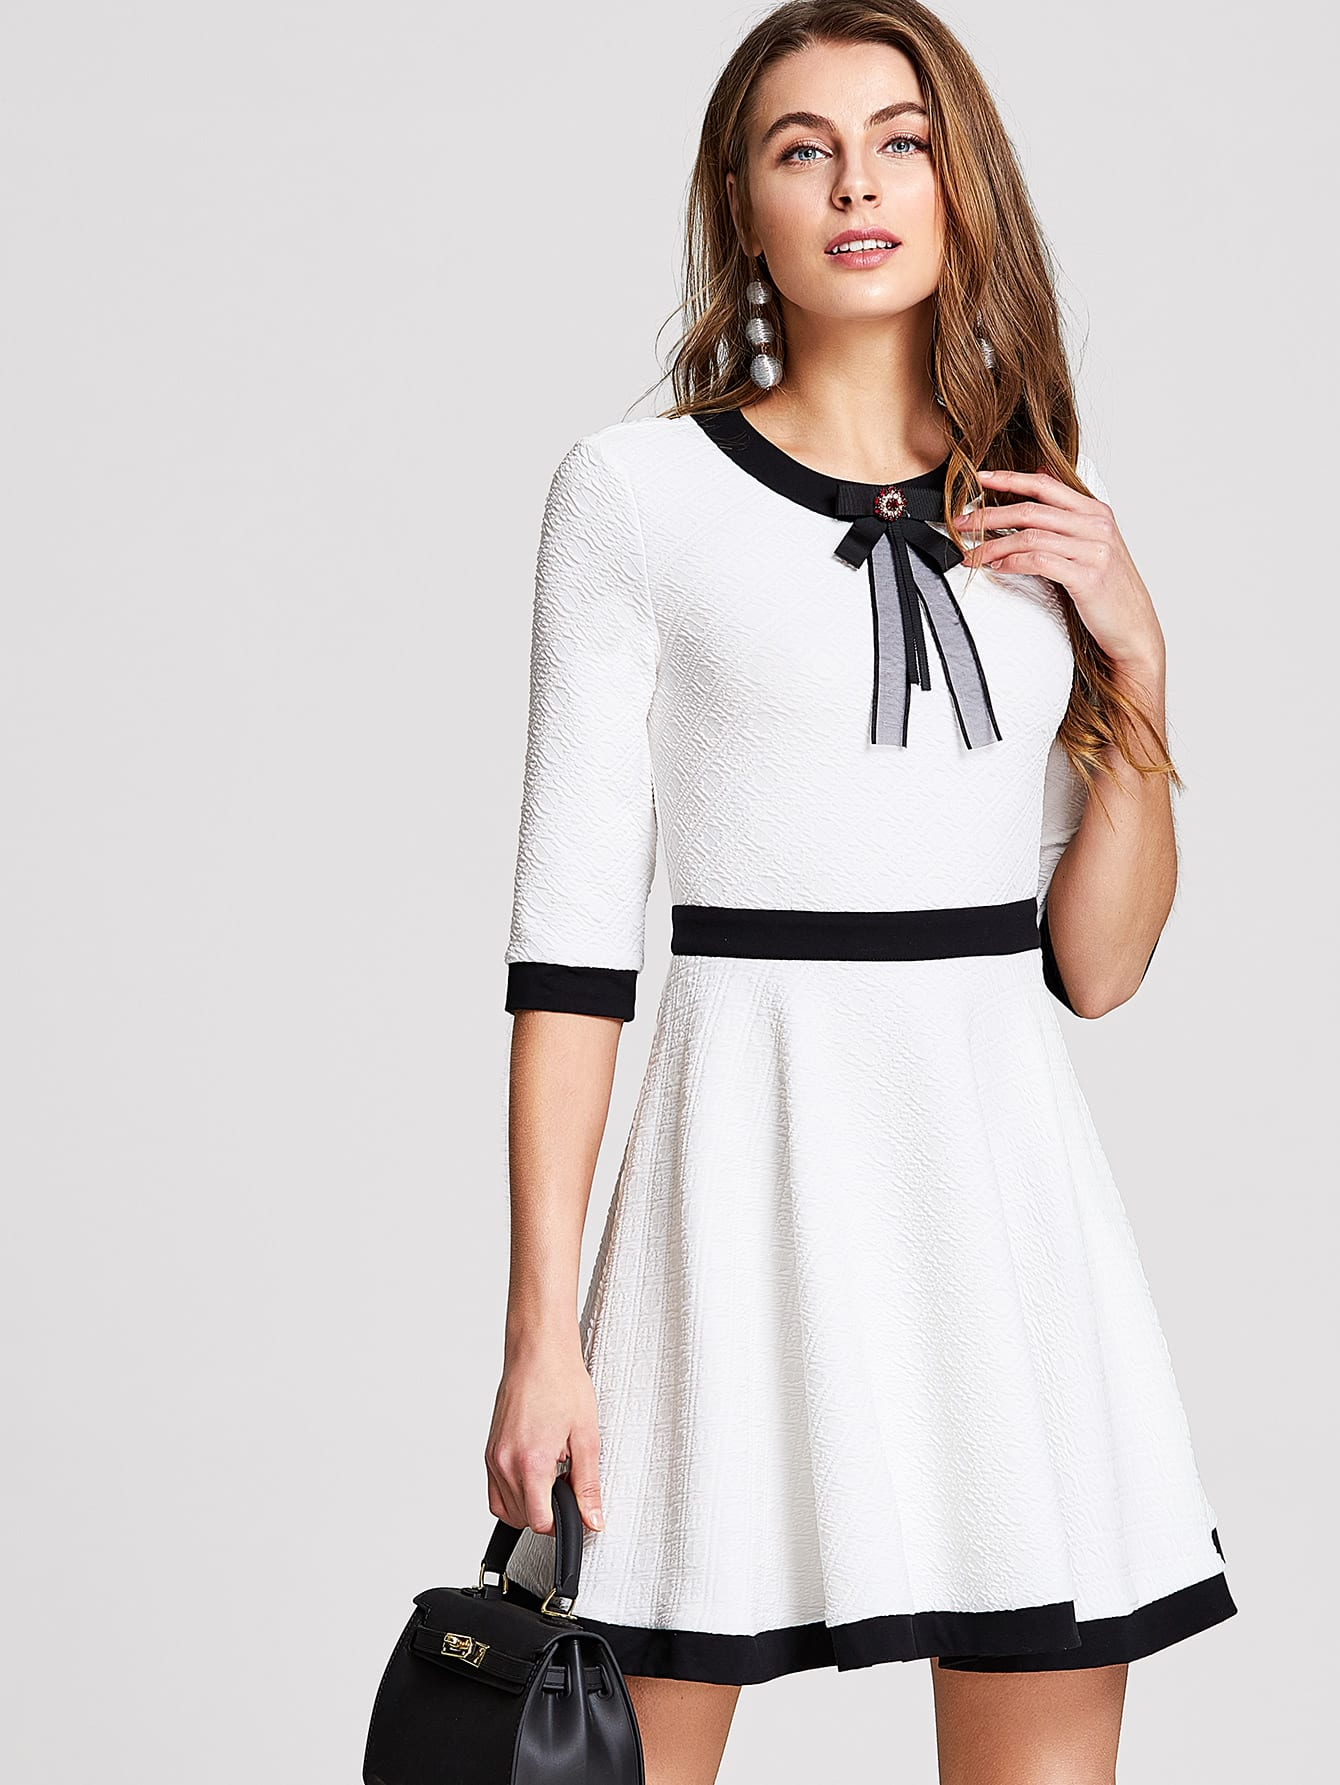 Купить Контрастная лента Fit & Flared Textured Dress, Nastya, SheIn